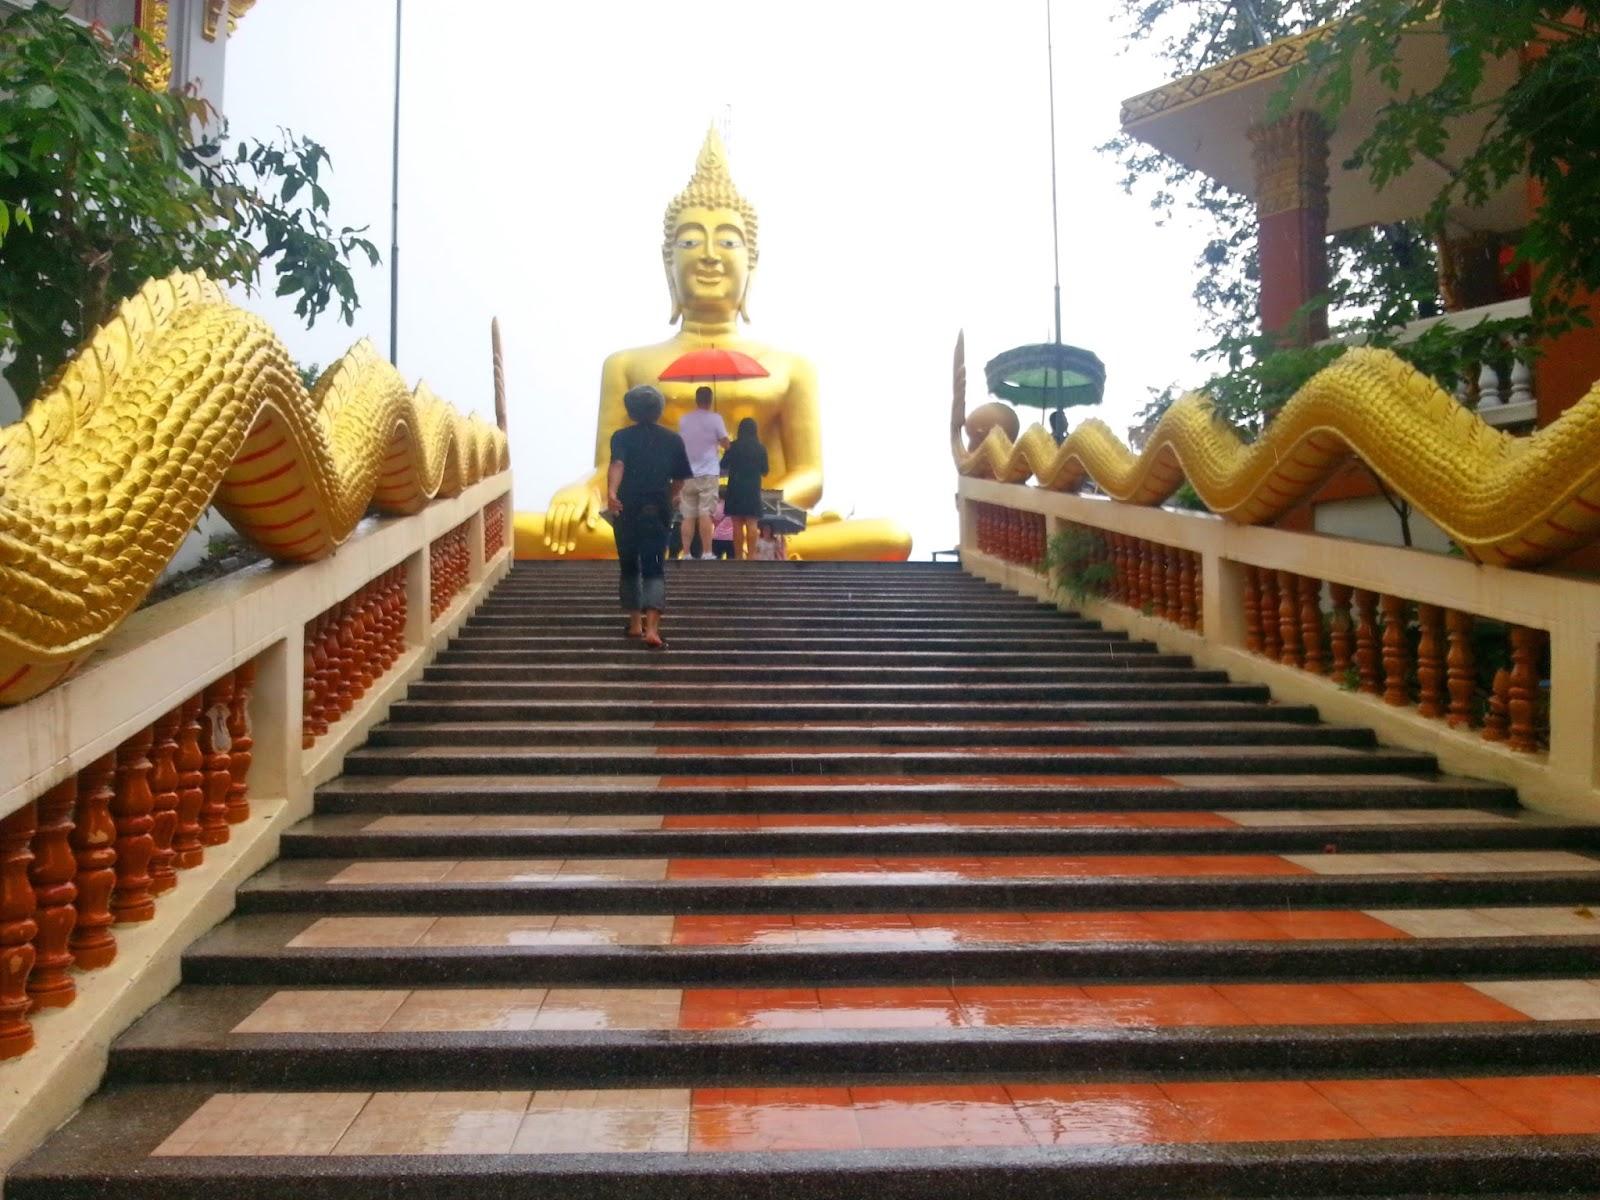 Big Buddha Temple in Pattaya city Tour